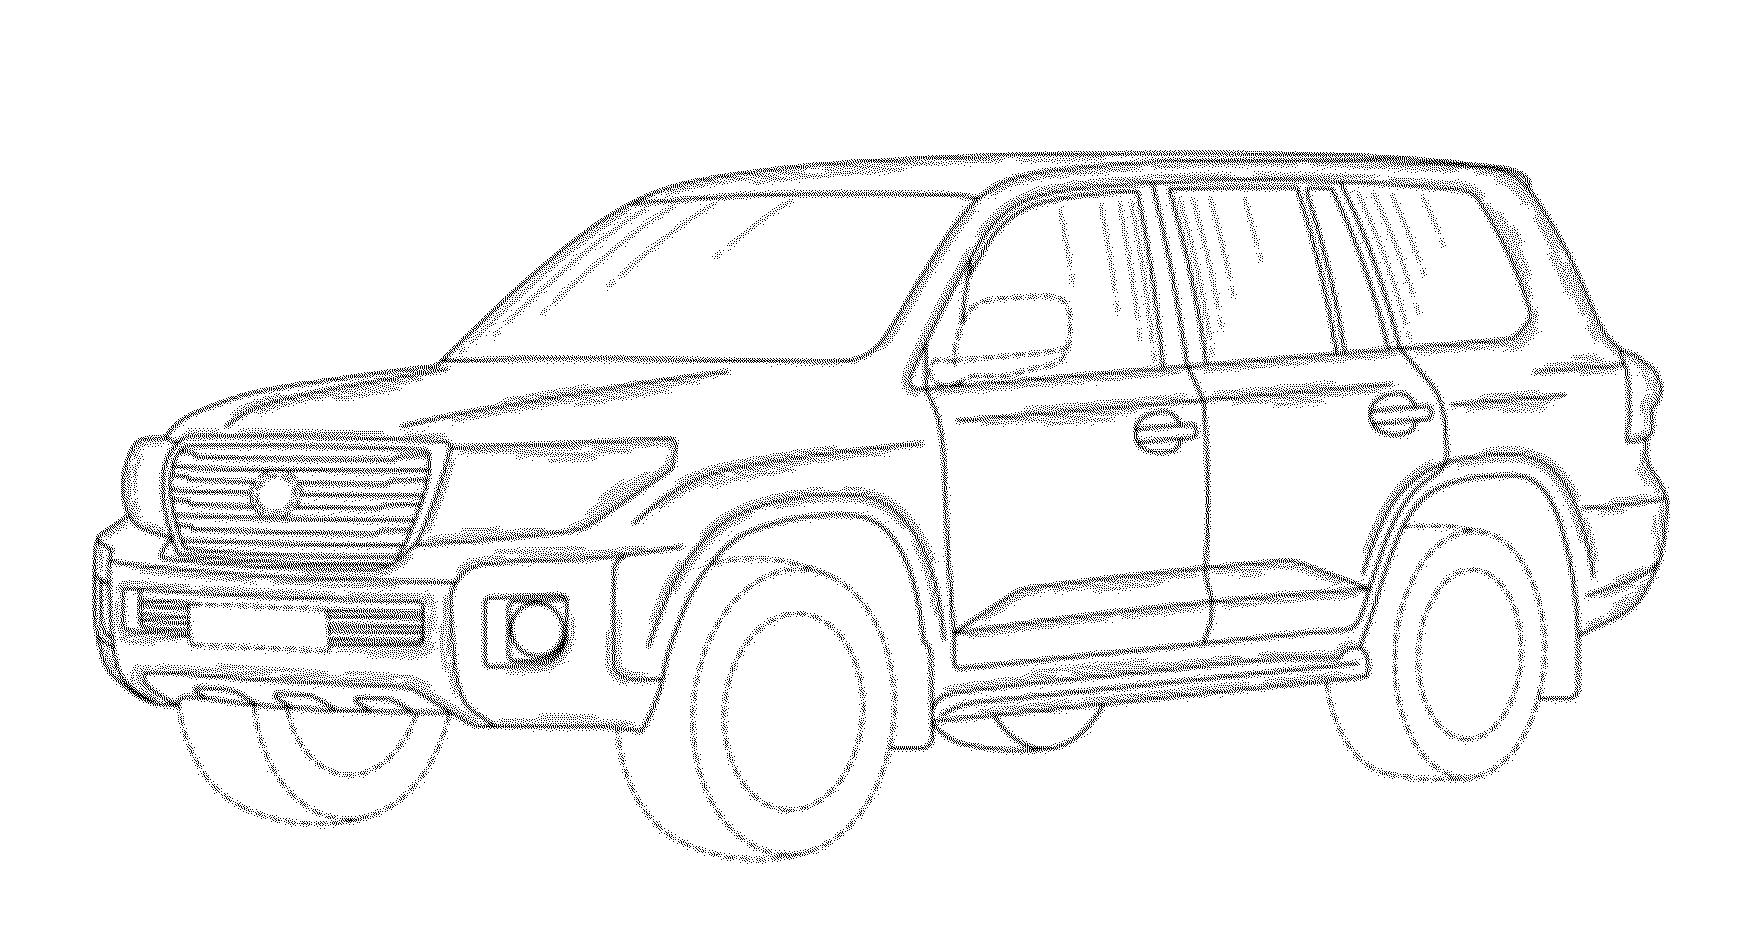 R34 Gtr Toy